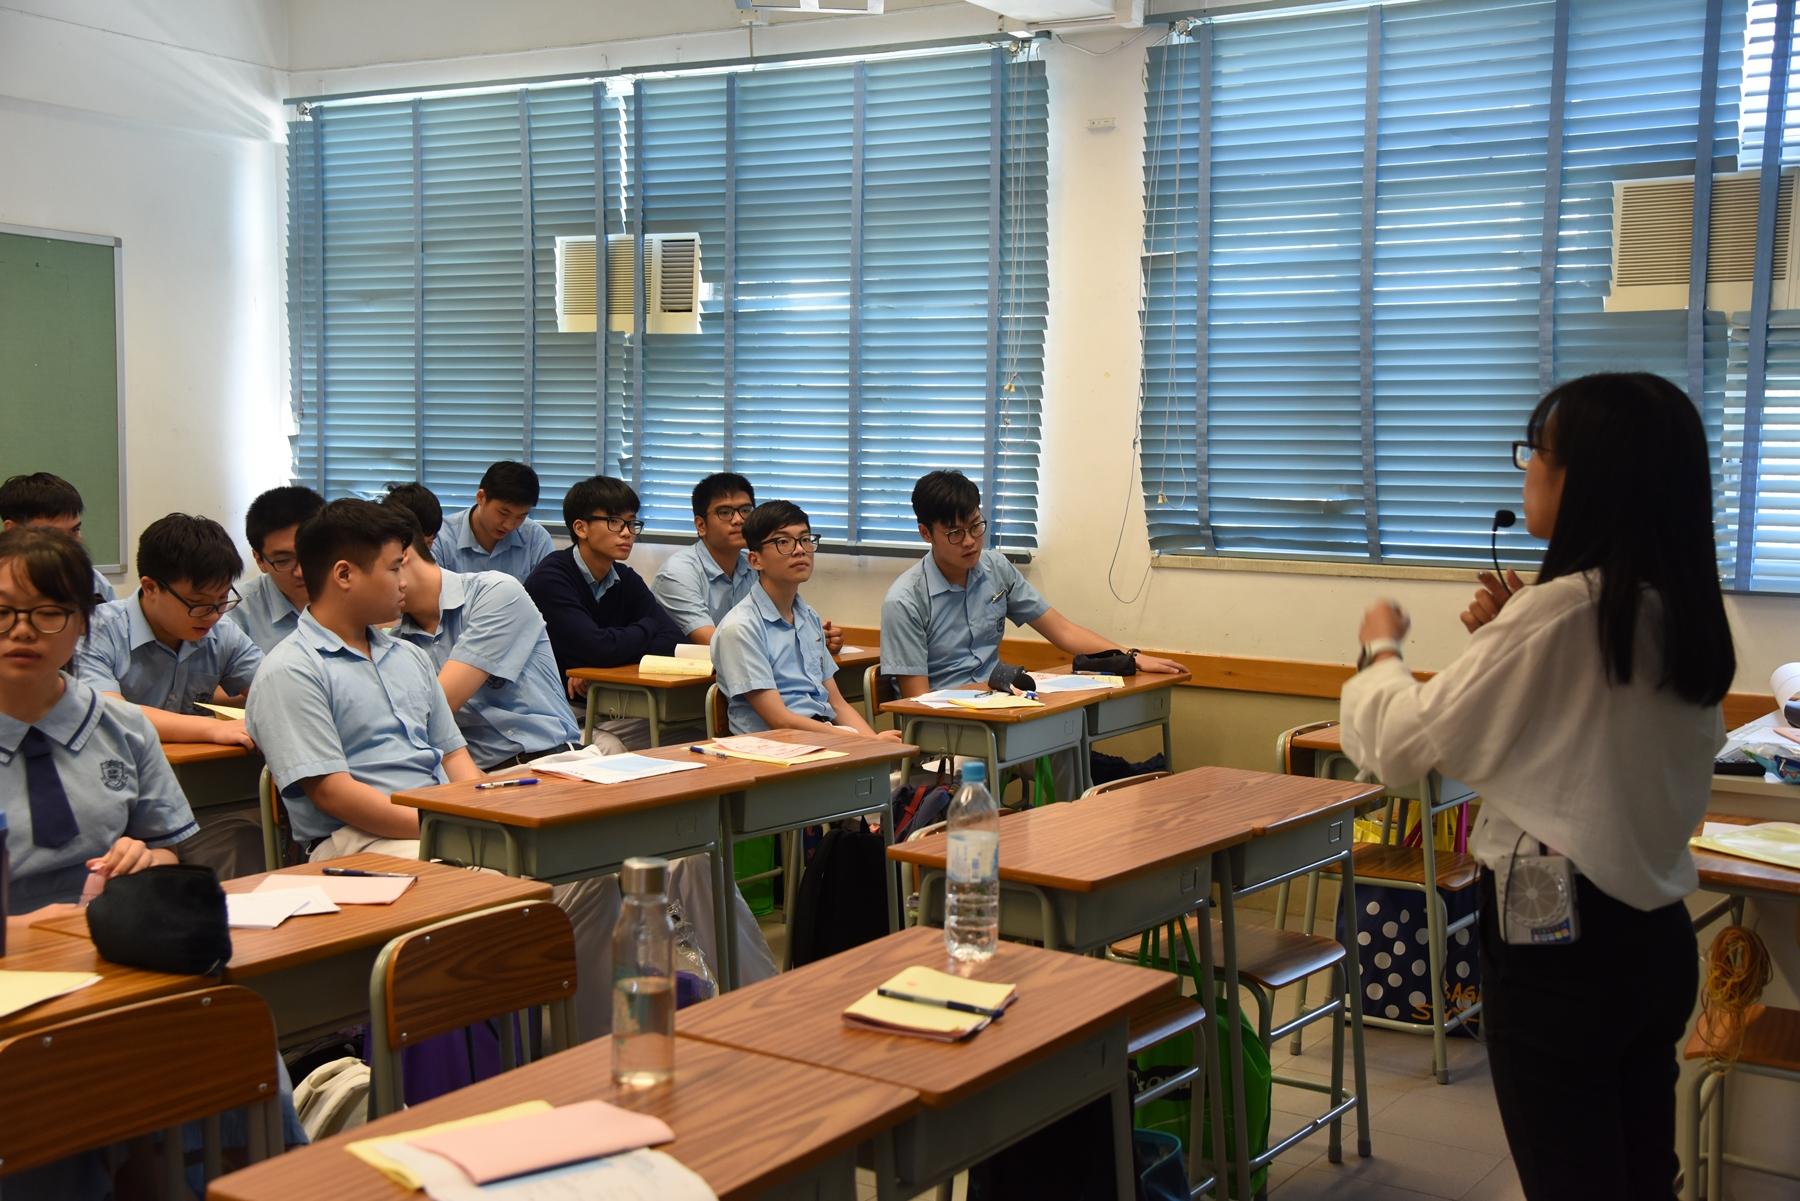 http://npc.edu.hk/sites/default/files/000063.jpg